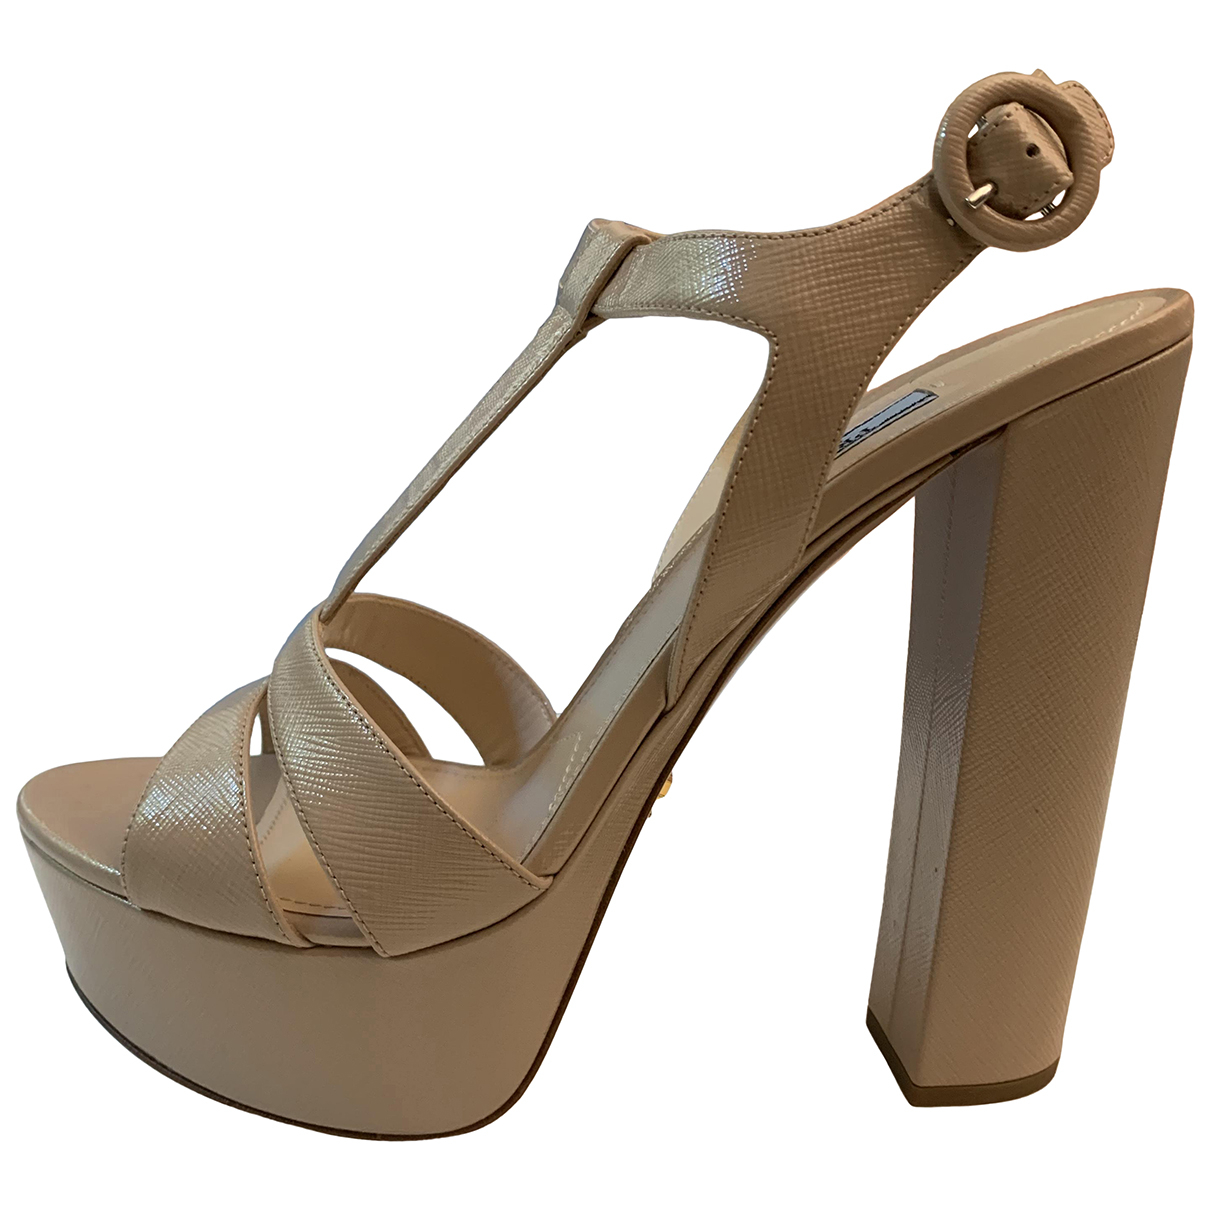 Prada N Beige Leather Sandals for Women 41 EU